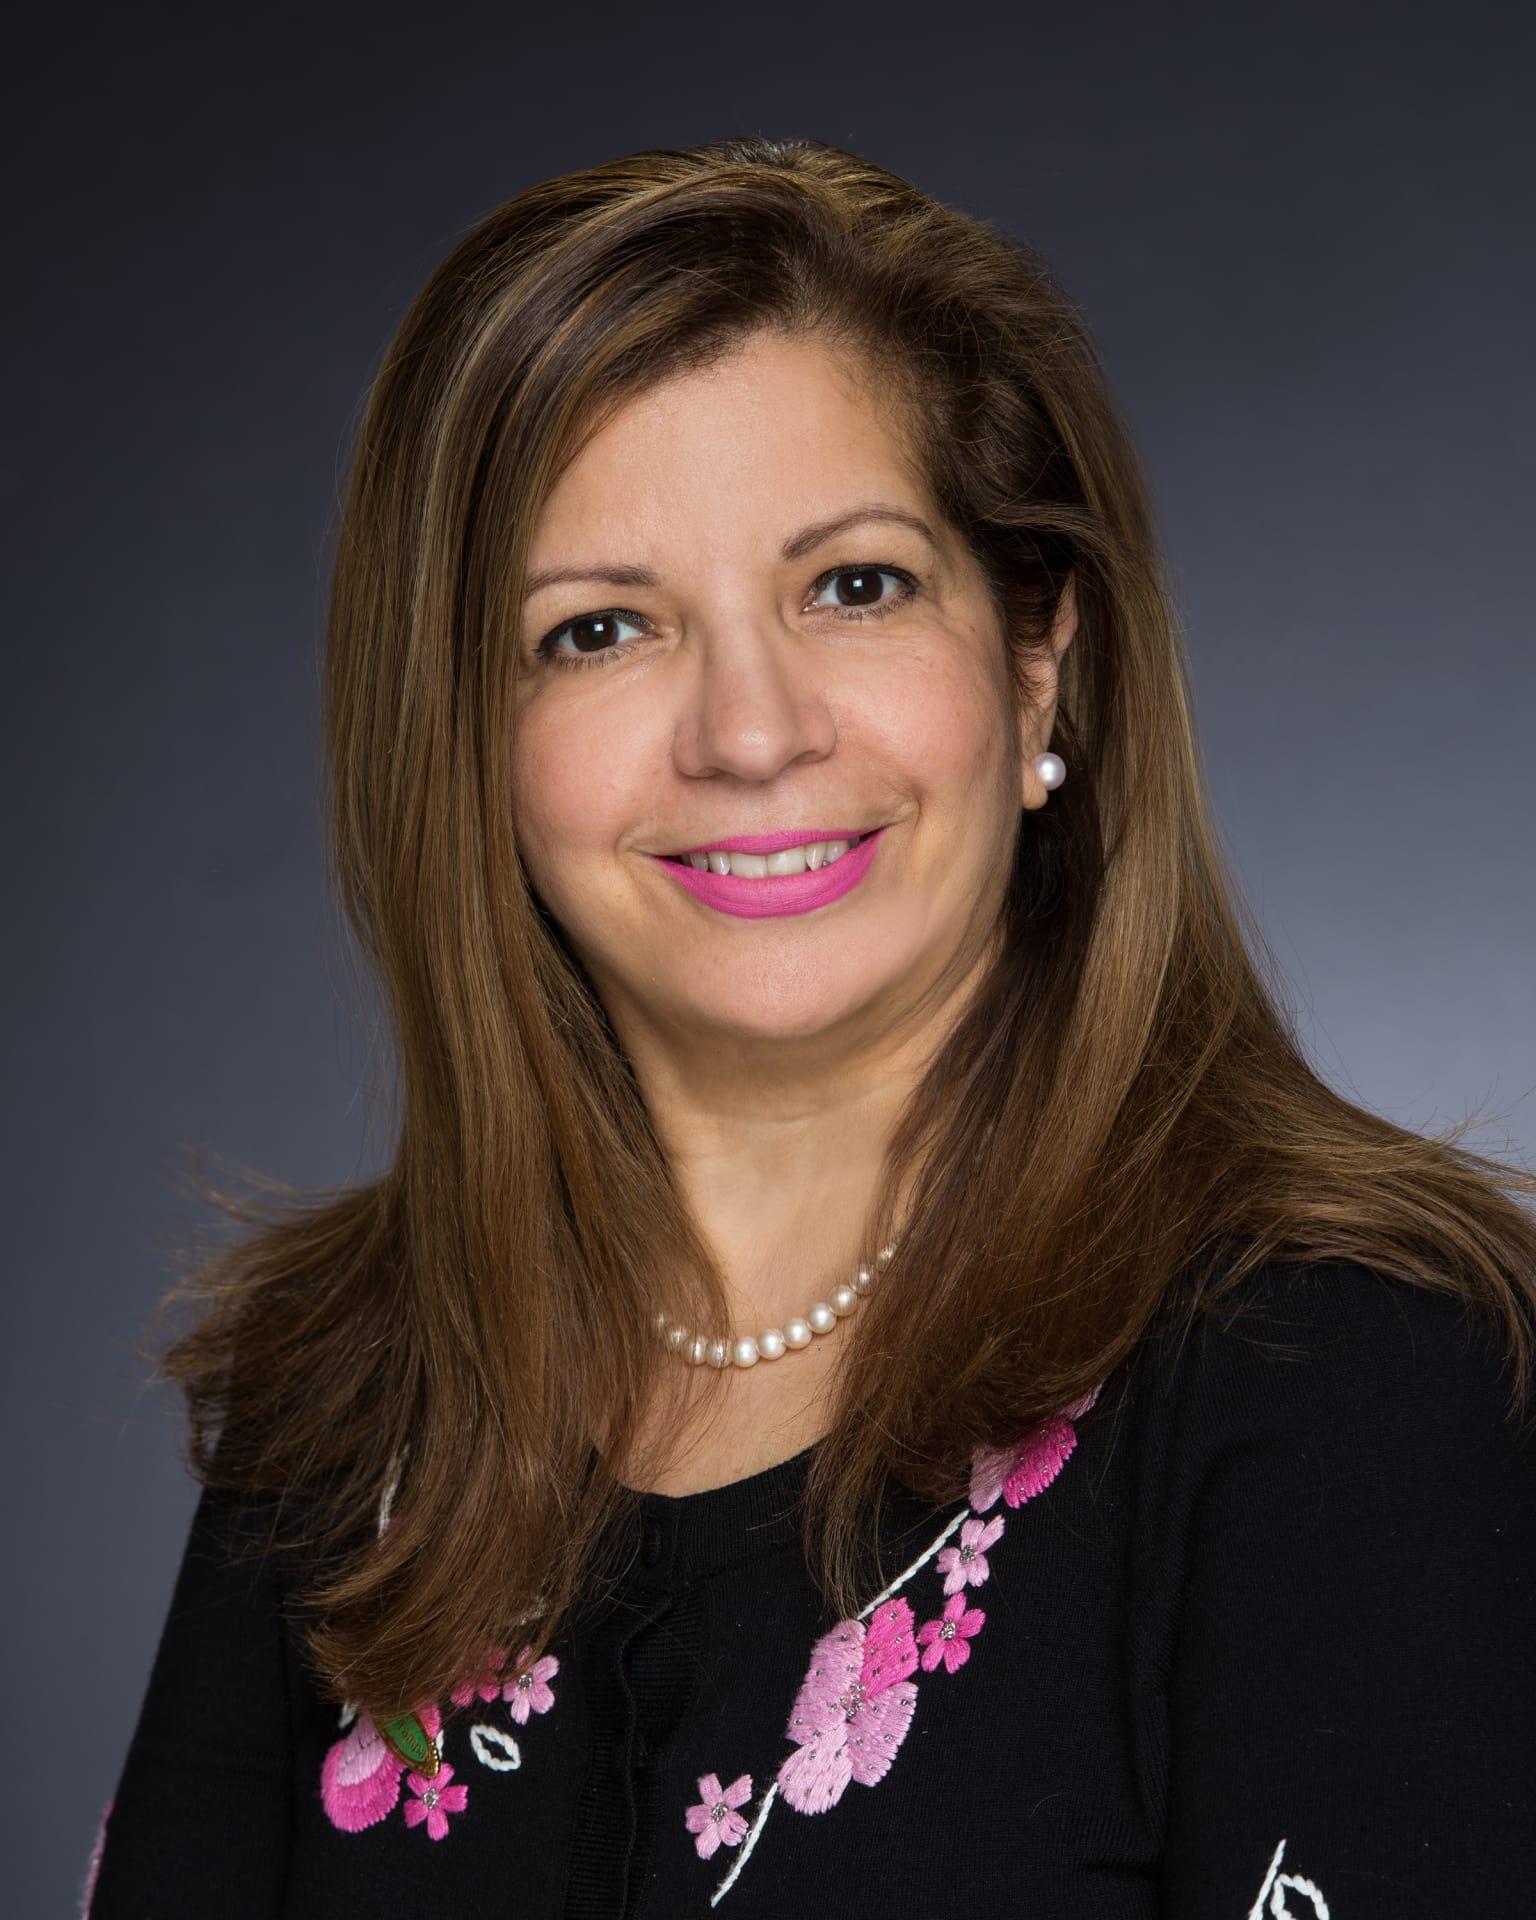 Fabiola Febles-Schooley - Paychex Inc.